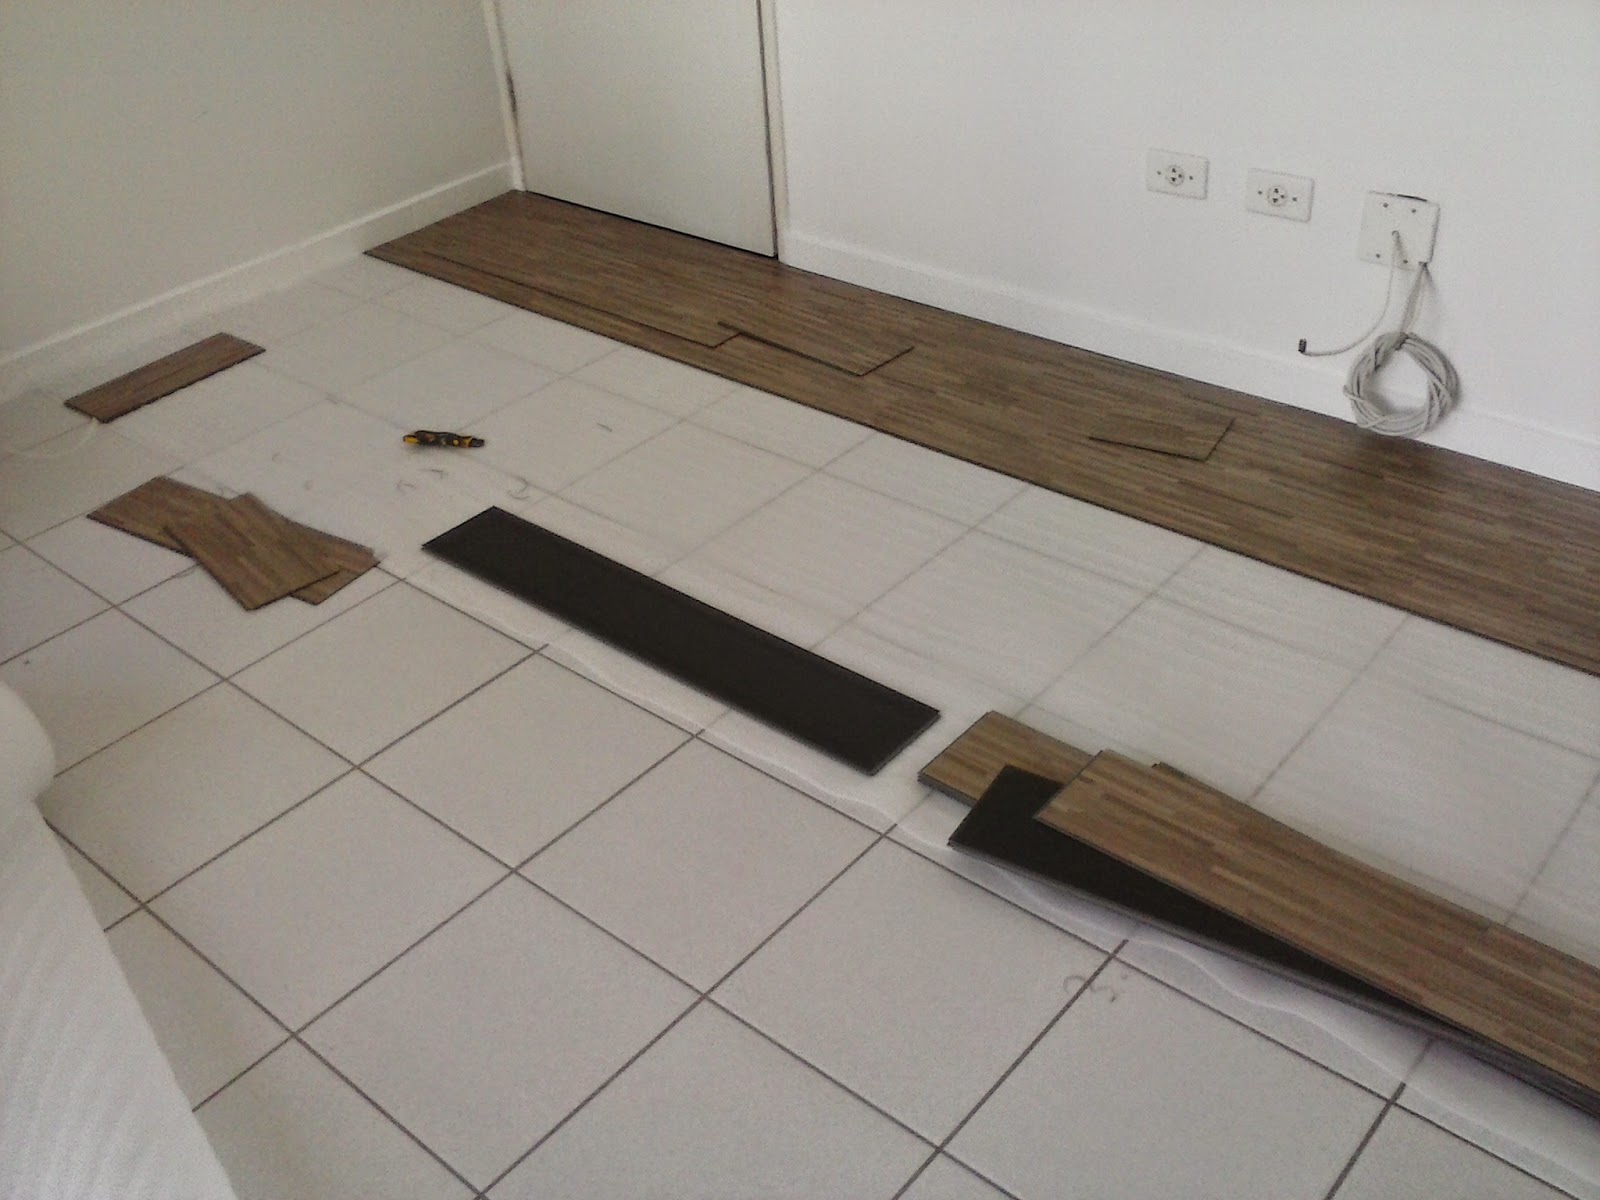 Vero revestimentos pisos vinilicos setembro 2014 for Pisos de ceramica